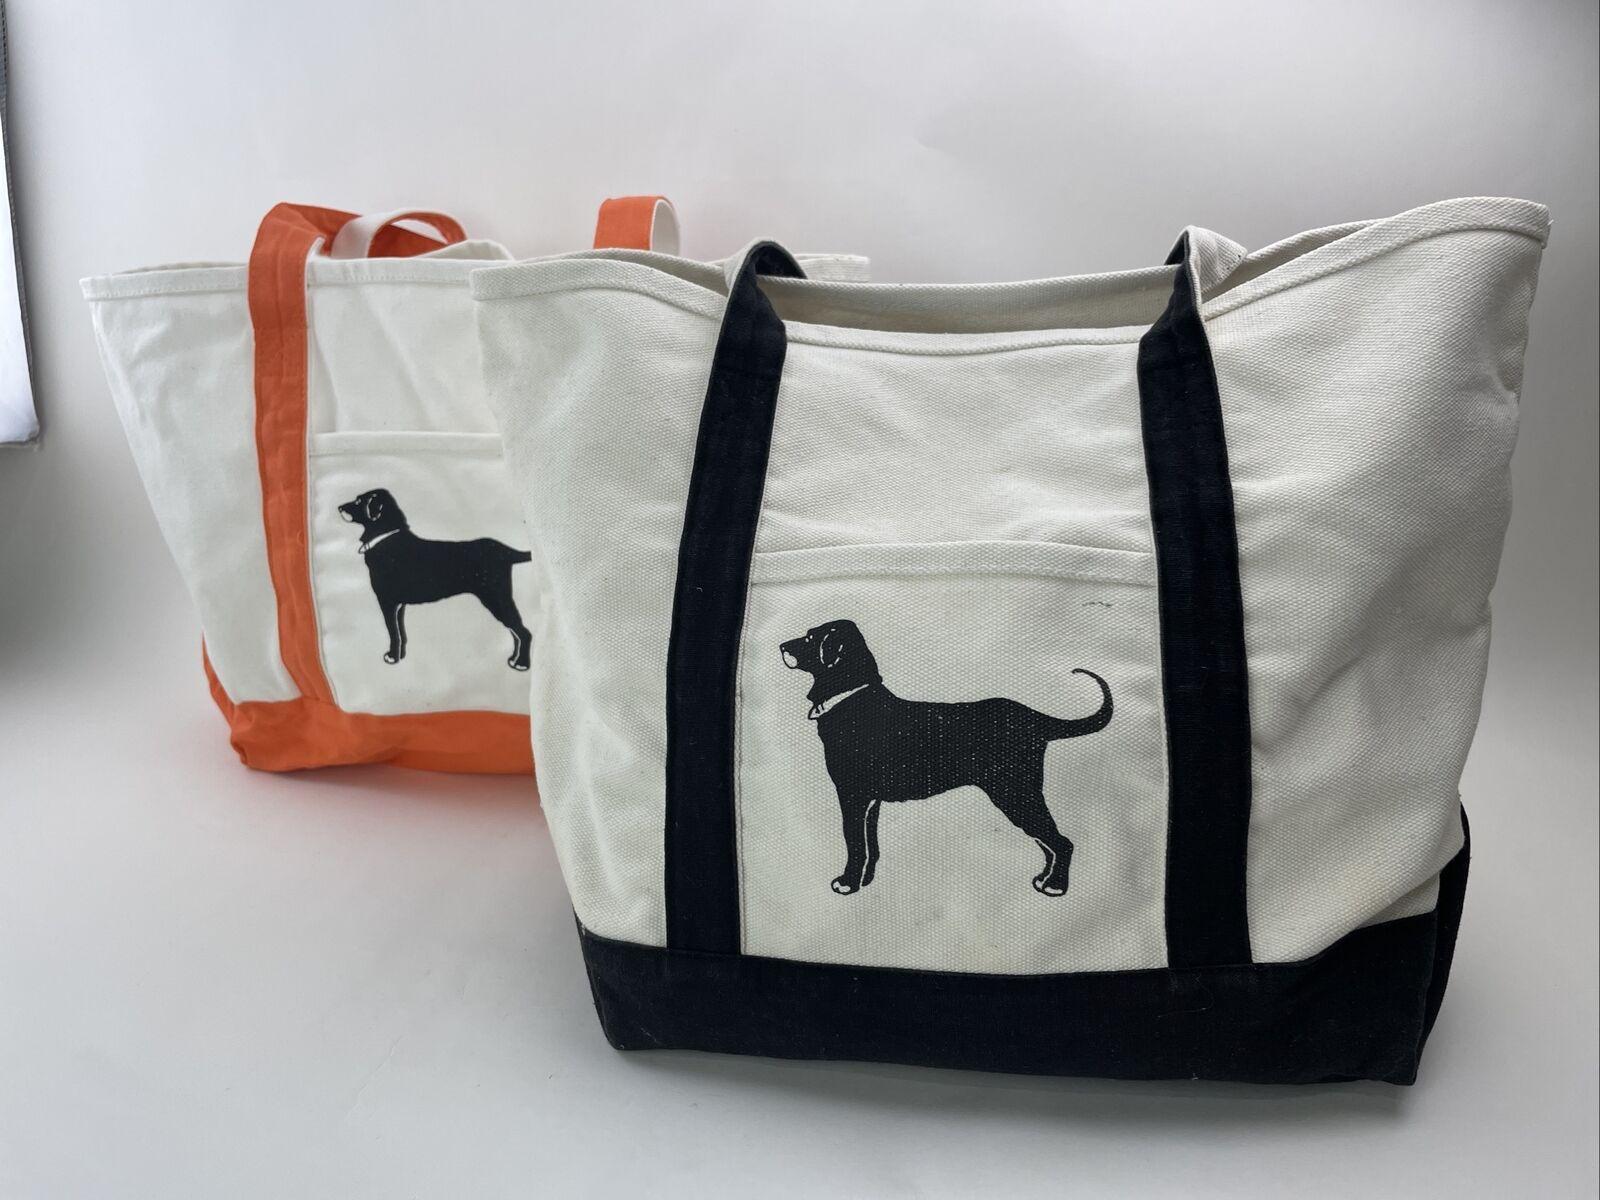 The Black Dog Marthas Vineyard Canvas Tote Bag Blck Orange Trim Handles Lot of 2